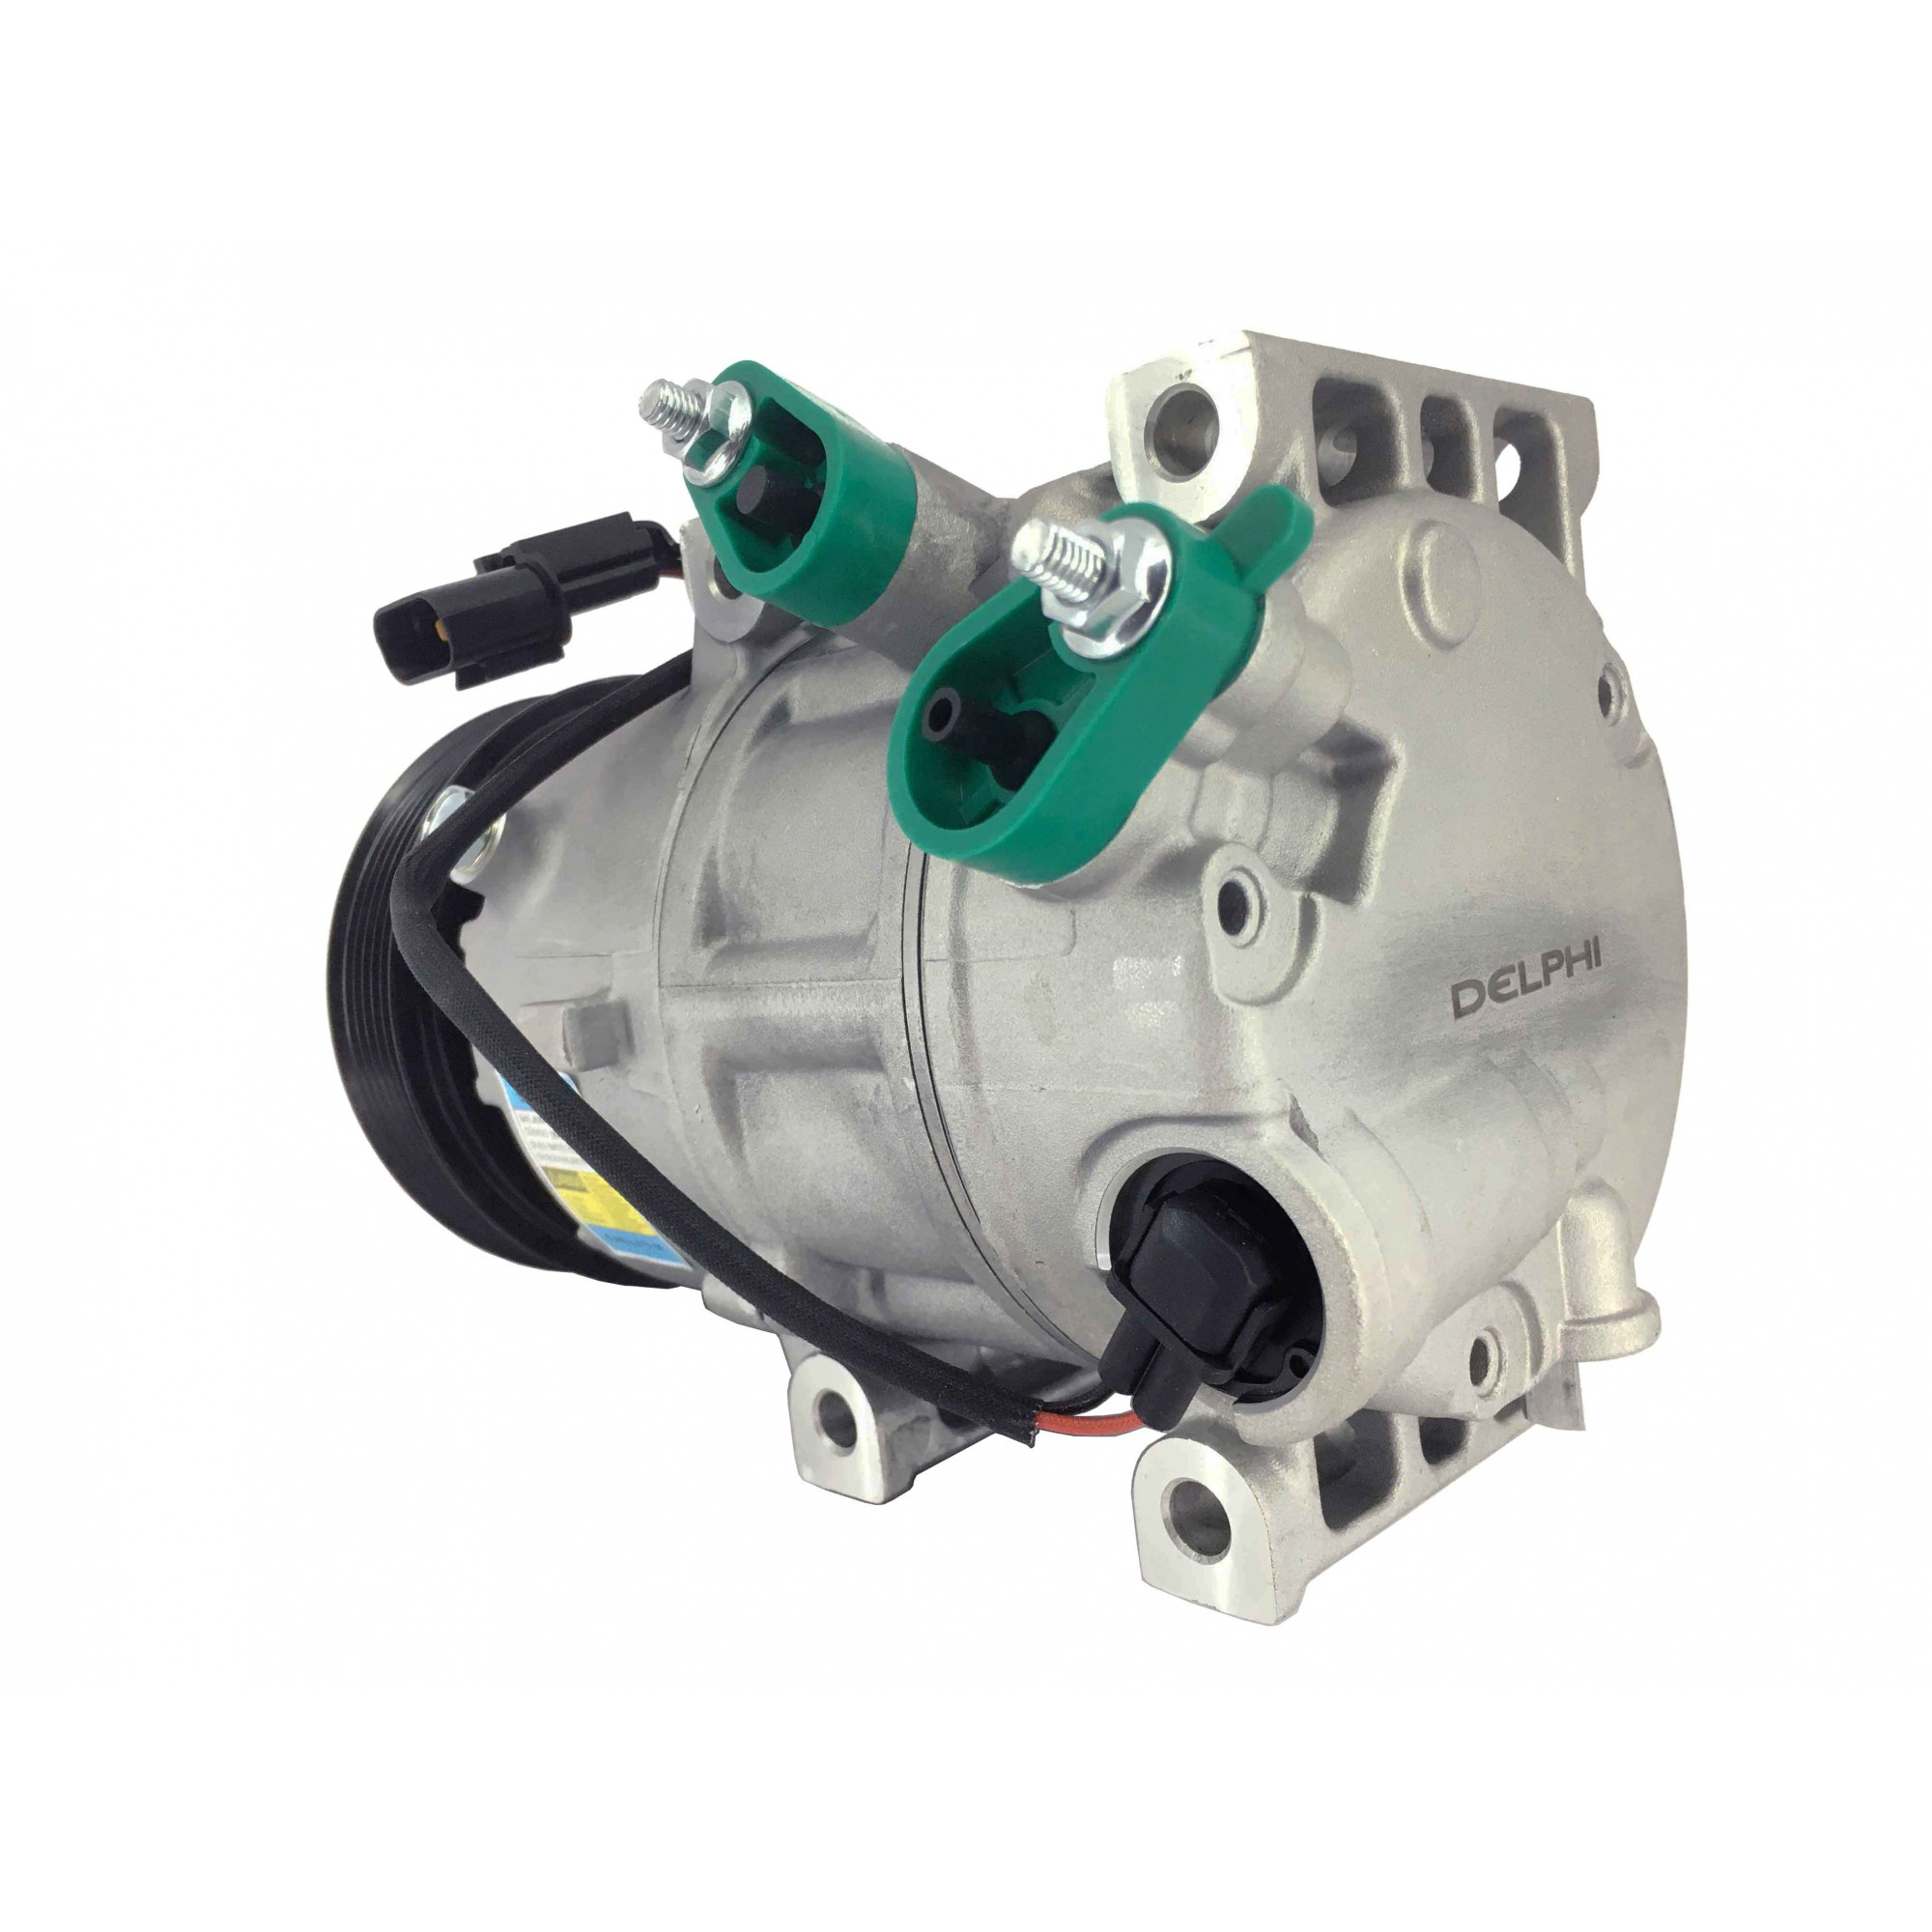 Compressor Sonata 2.4 / Azera 3.0 - Original DELPHI